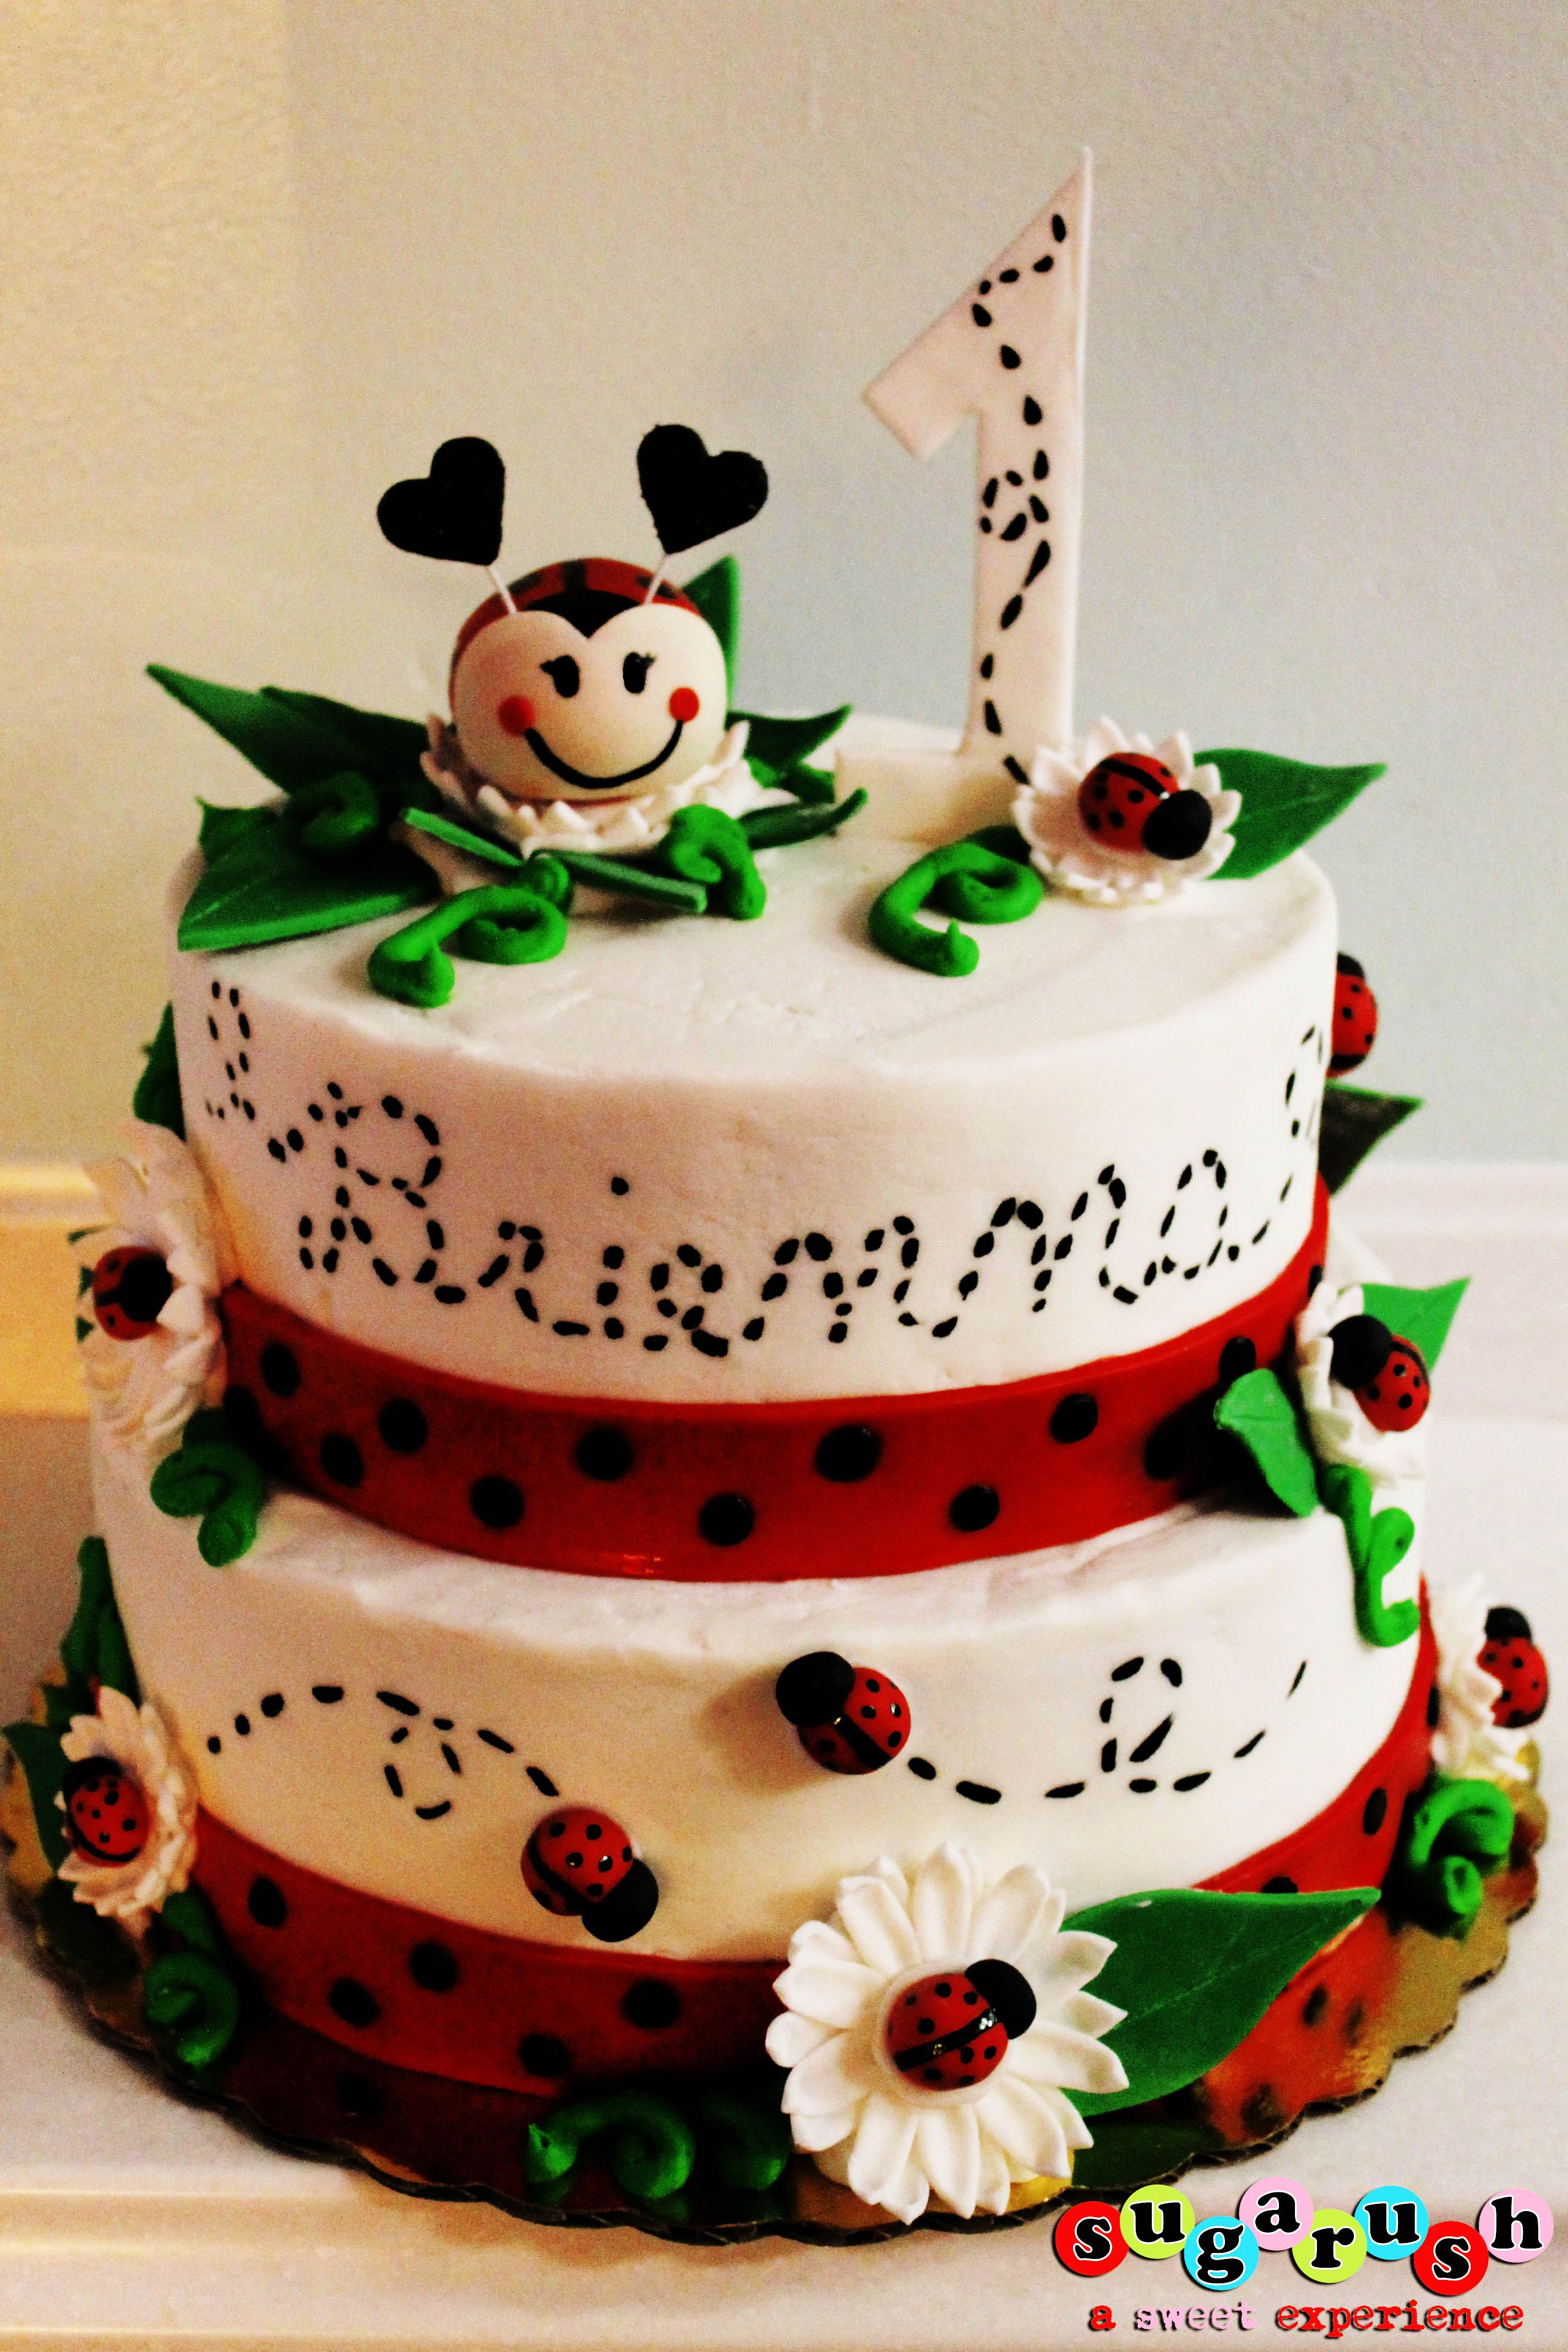 Lady Bug Cake Cathy should make this CAKES DE ABEJAS MARIQUITAS